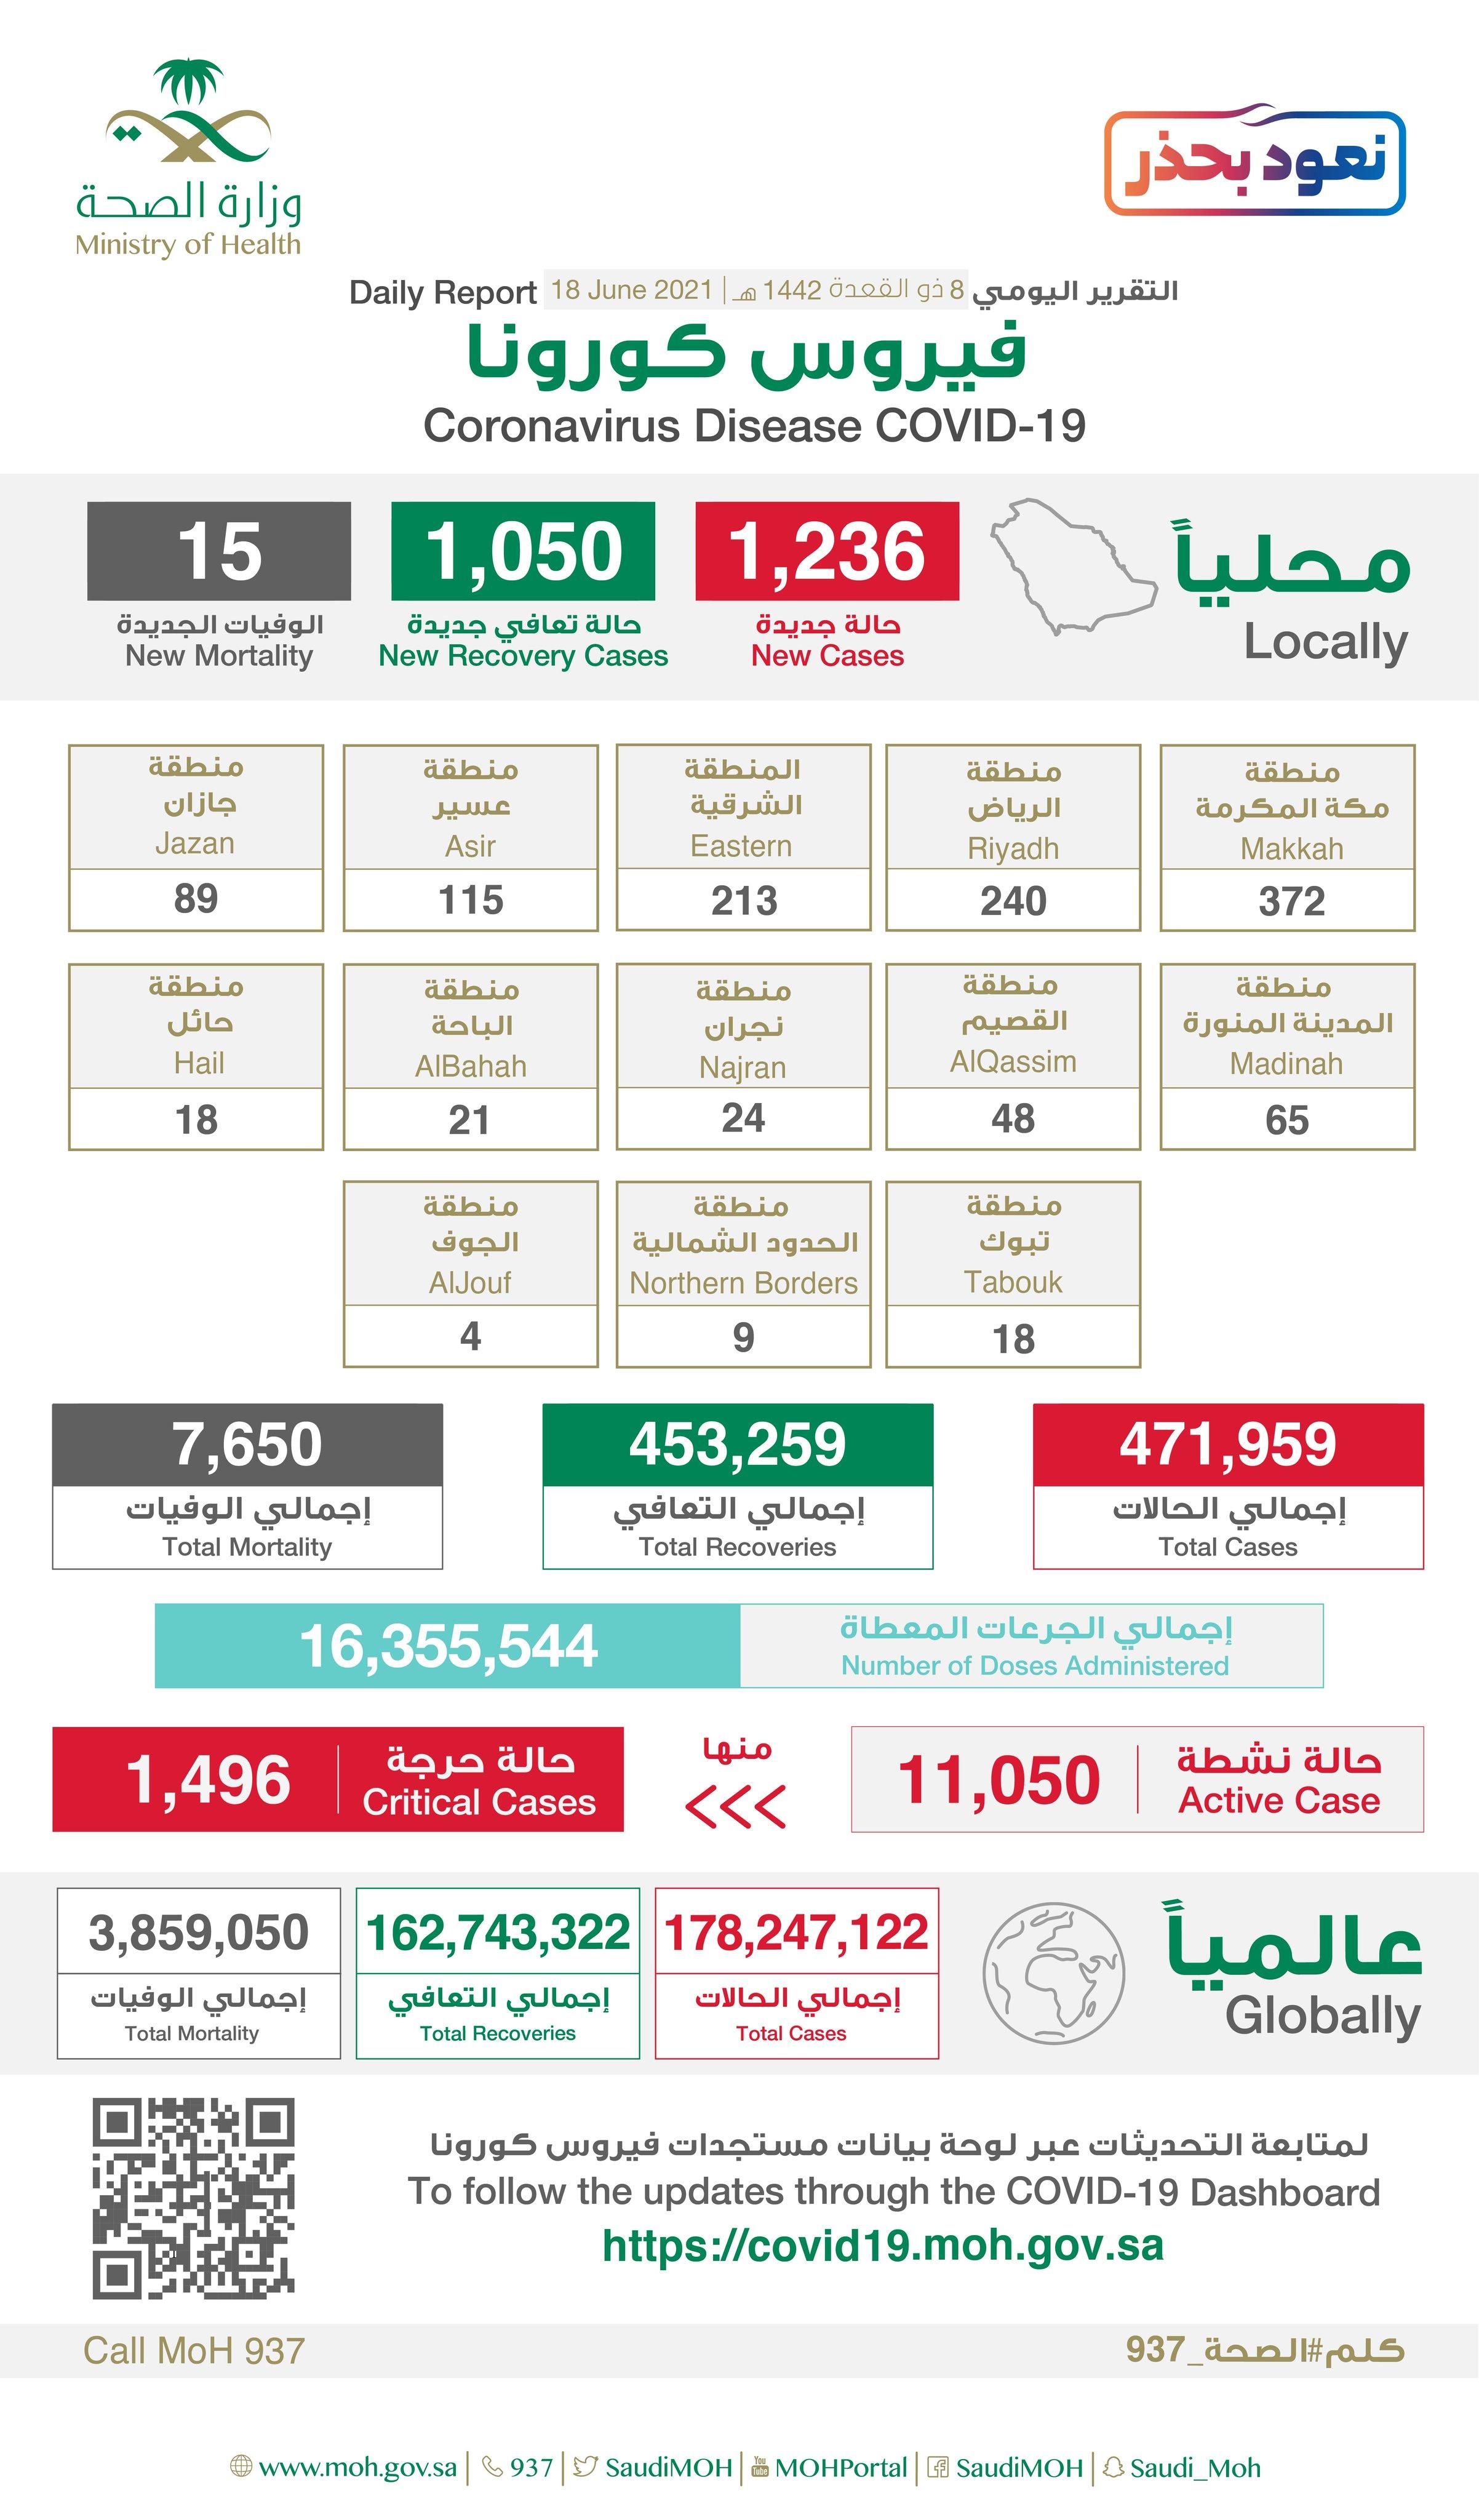 Saudi Arabia Coronavirus : Total Cases :471,959 , New Cases : 1,236 , Cured : 453,259 , Deaths: 7,650, Active Cases : 11,050